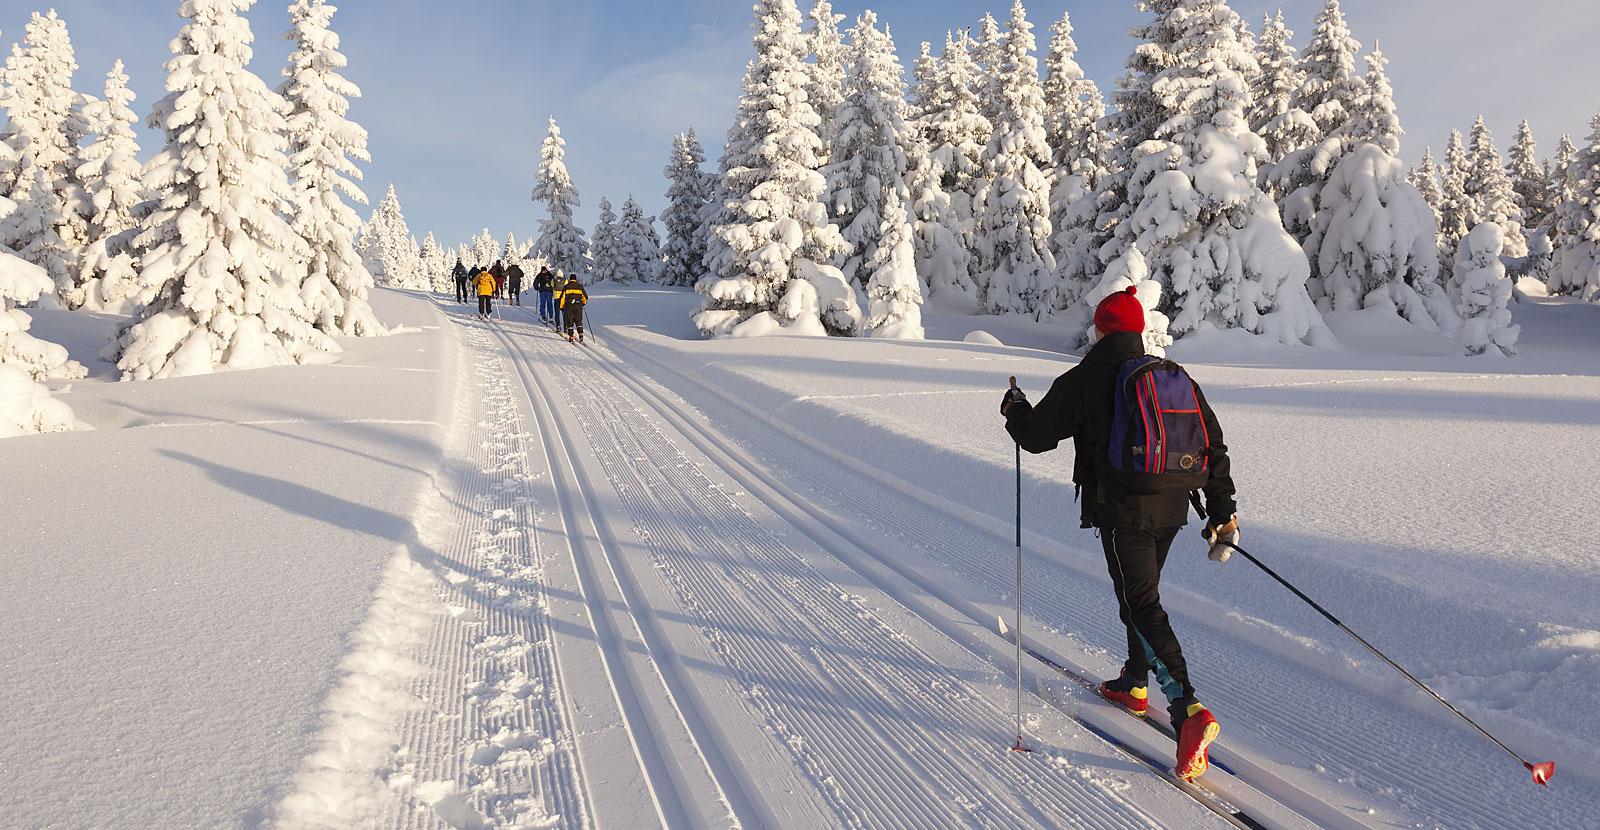 Winter im Bayerischen Wald  - Langlaufloipen